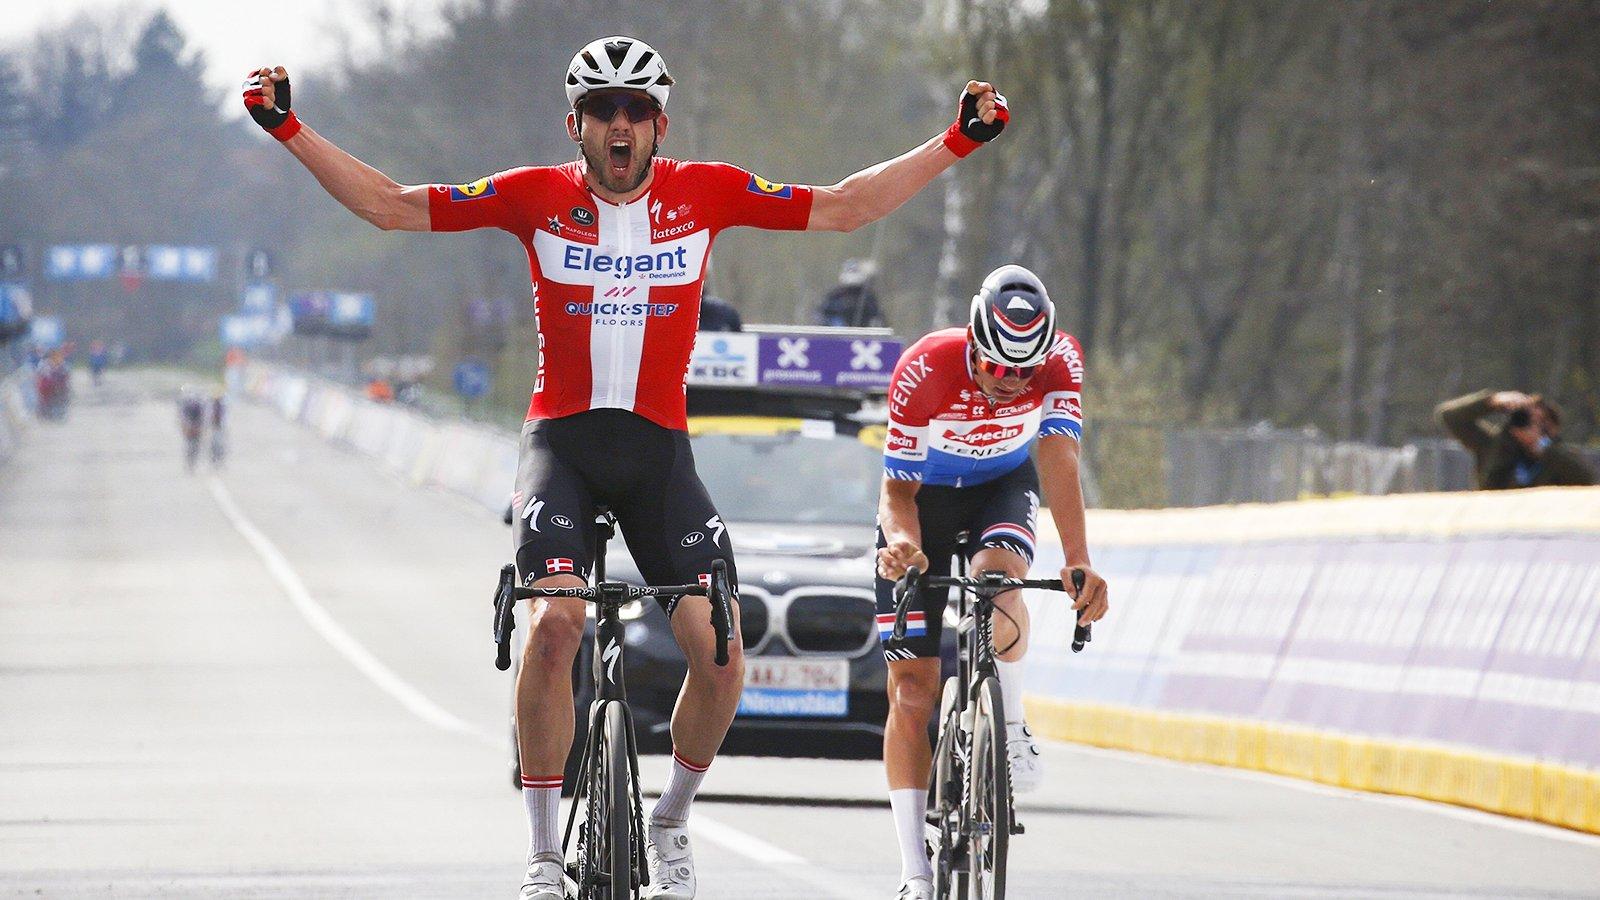 Dia de Páscoa com surpresa! Kasper Asgreen vence o Tour de Flandres!